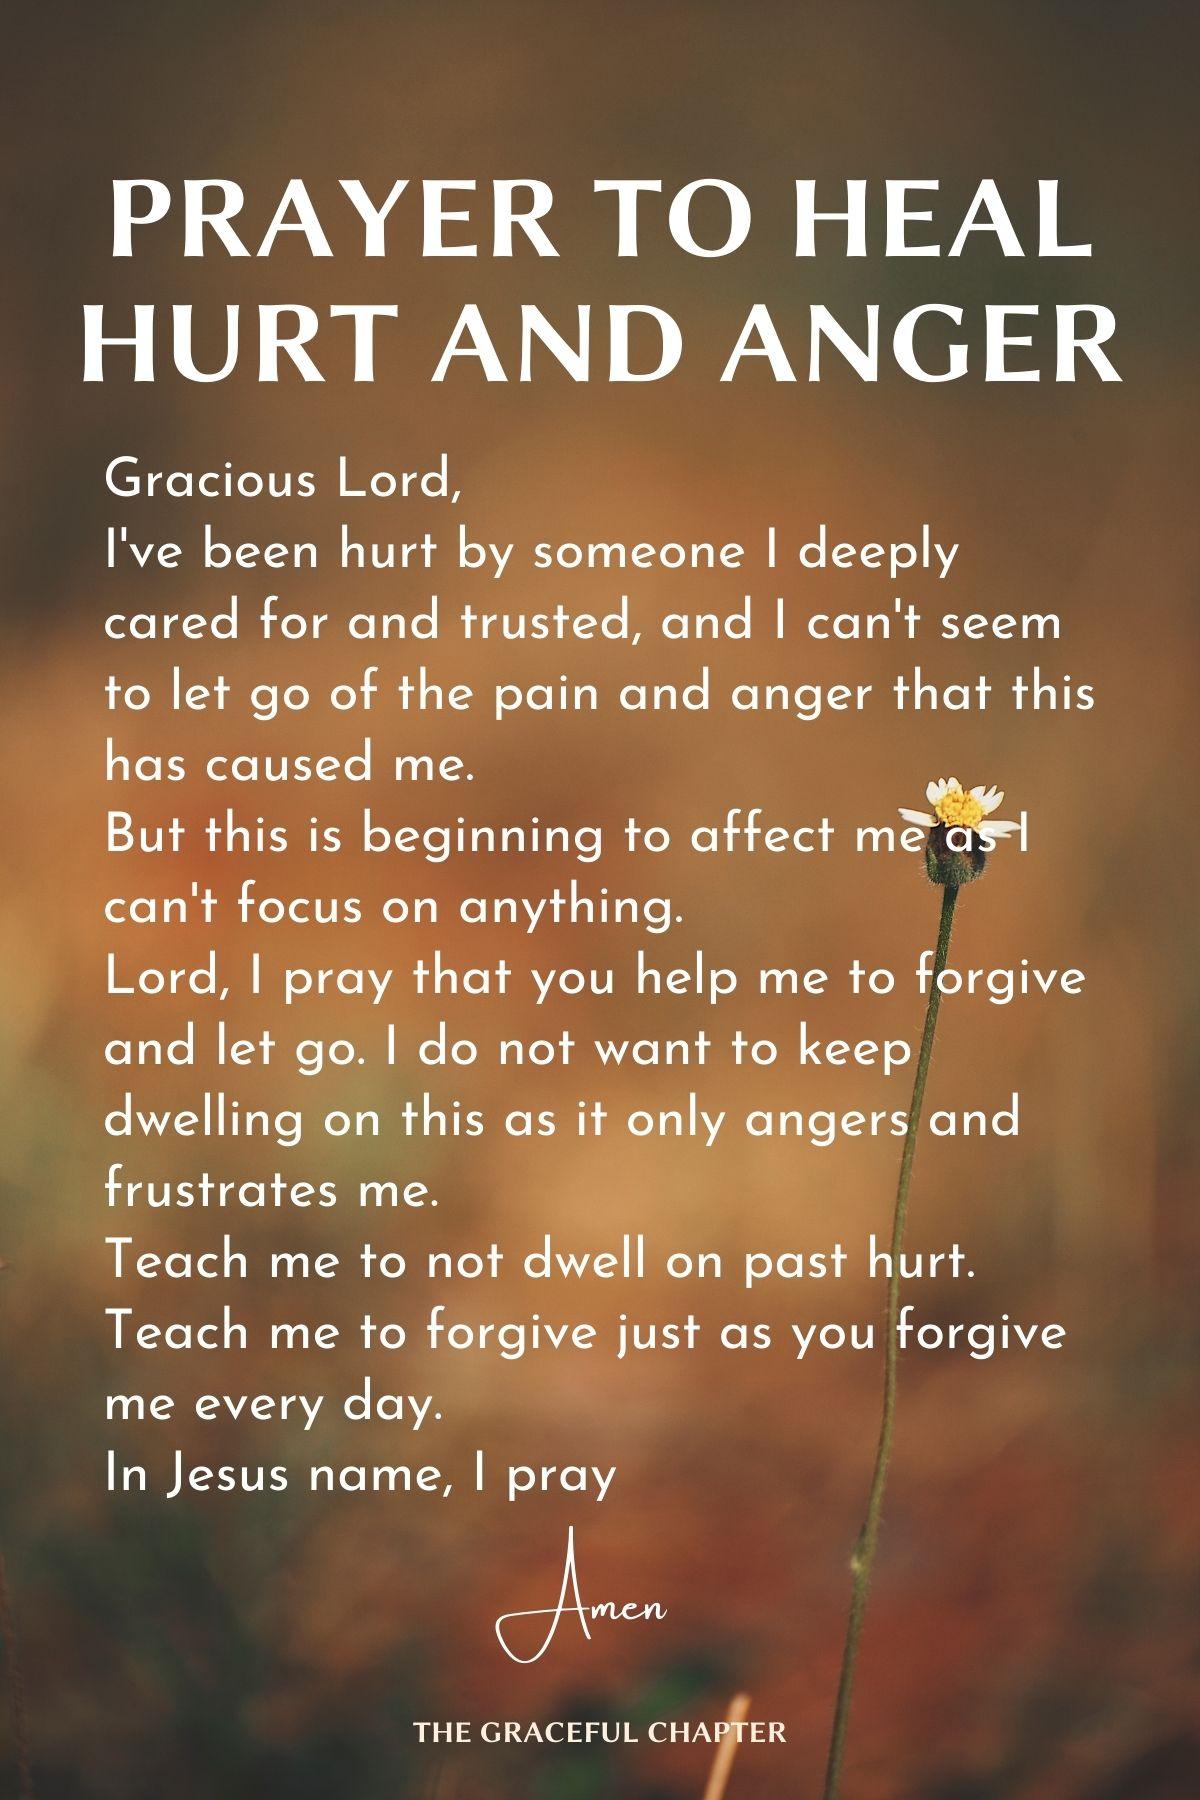 Prayer to heal hurt and anger